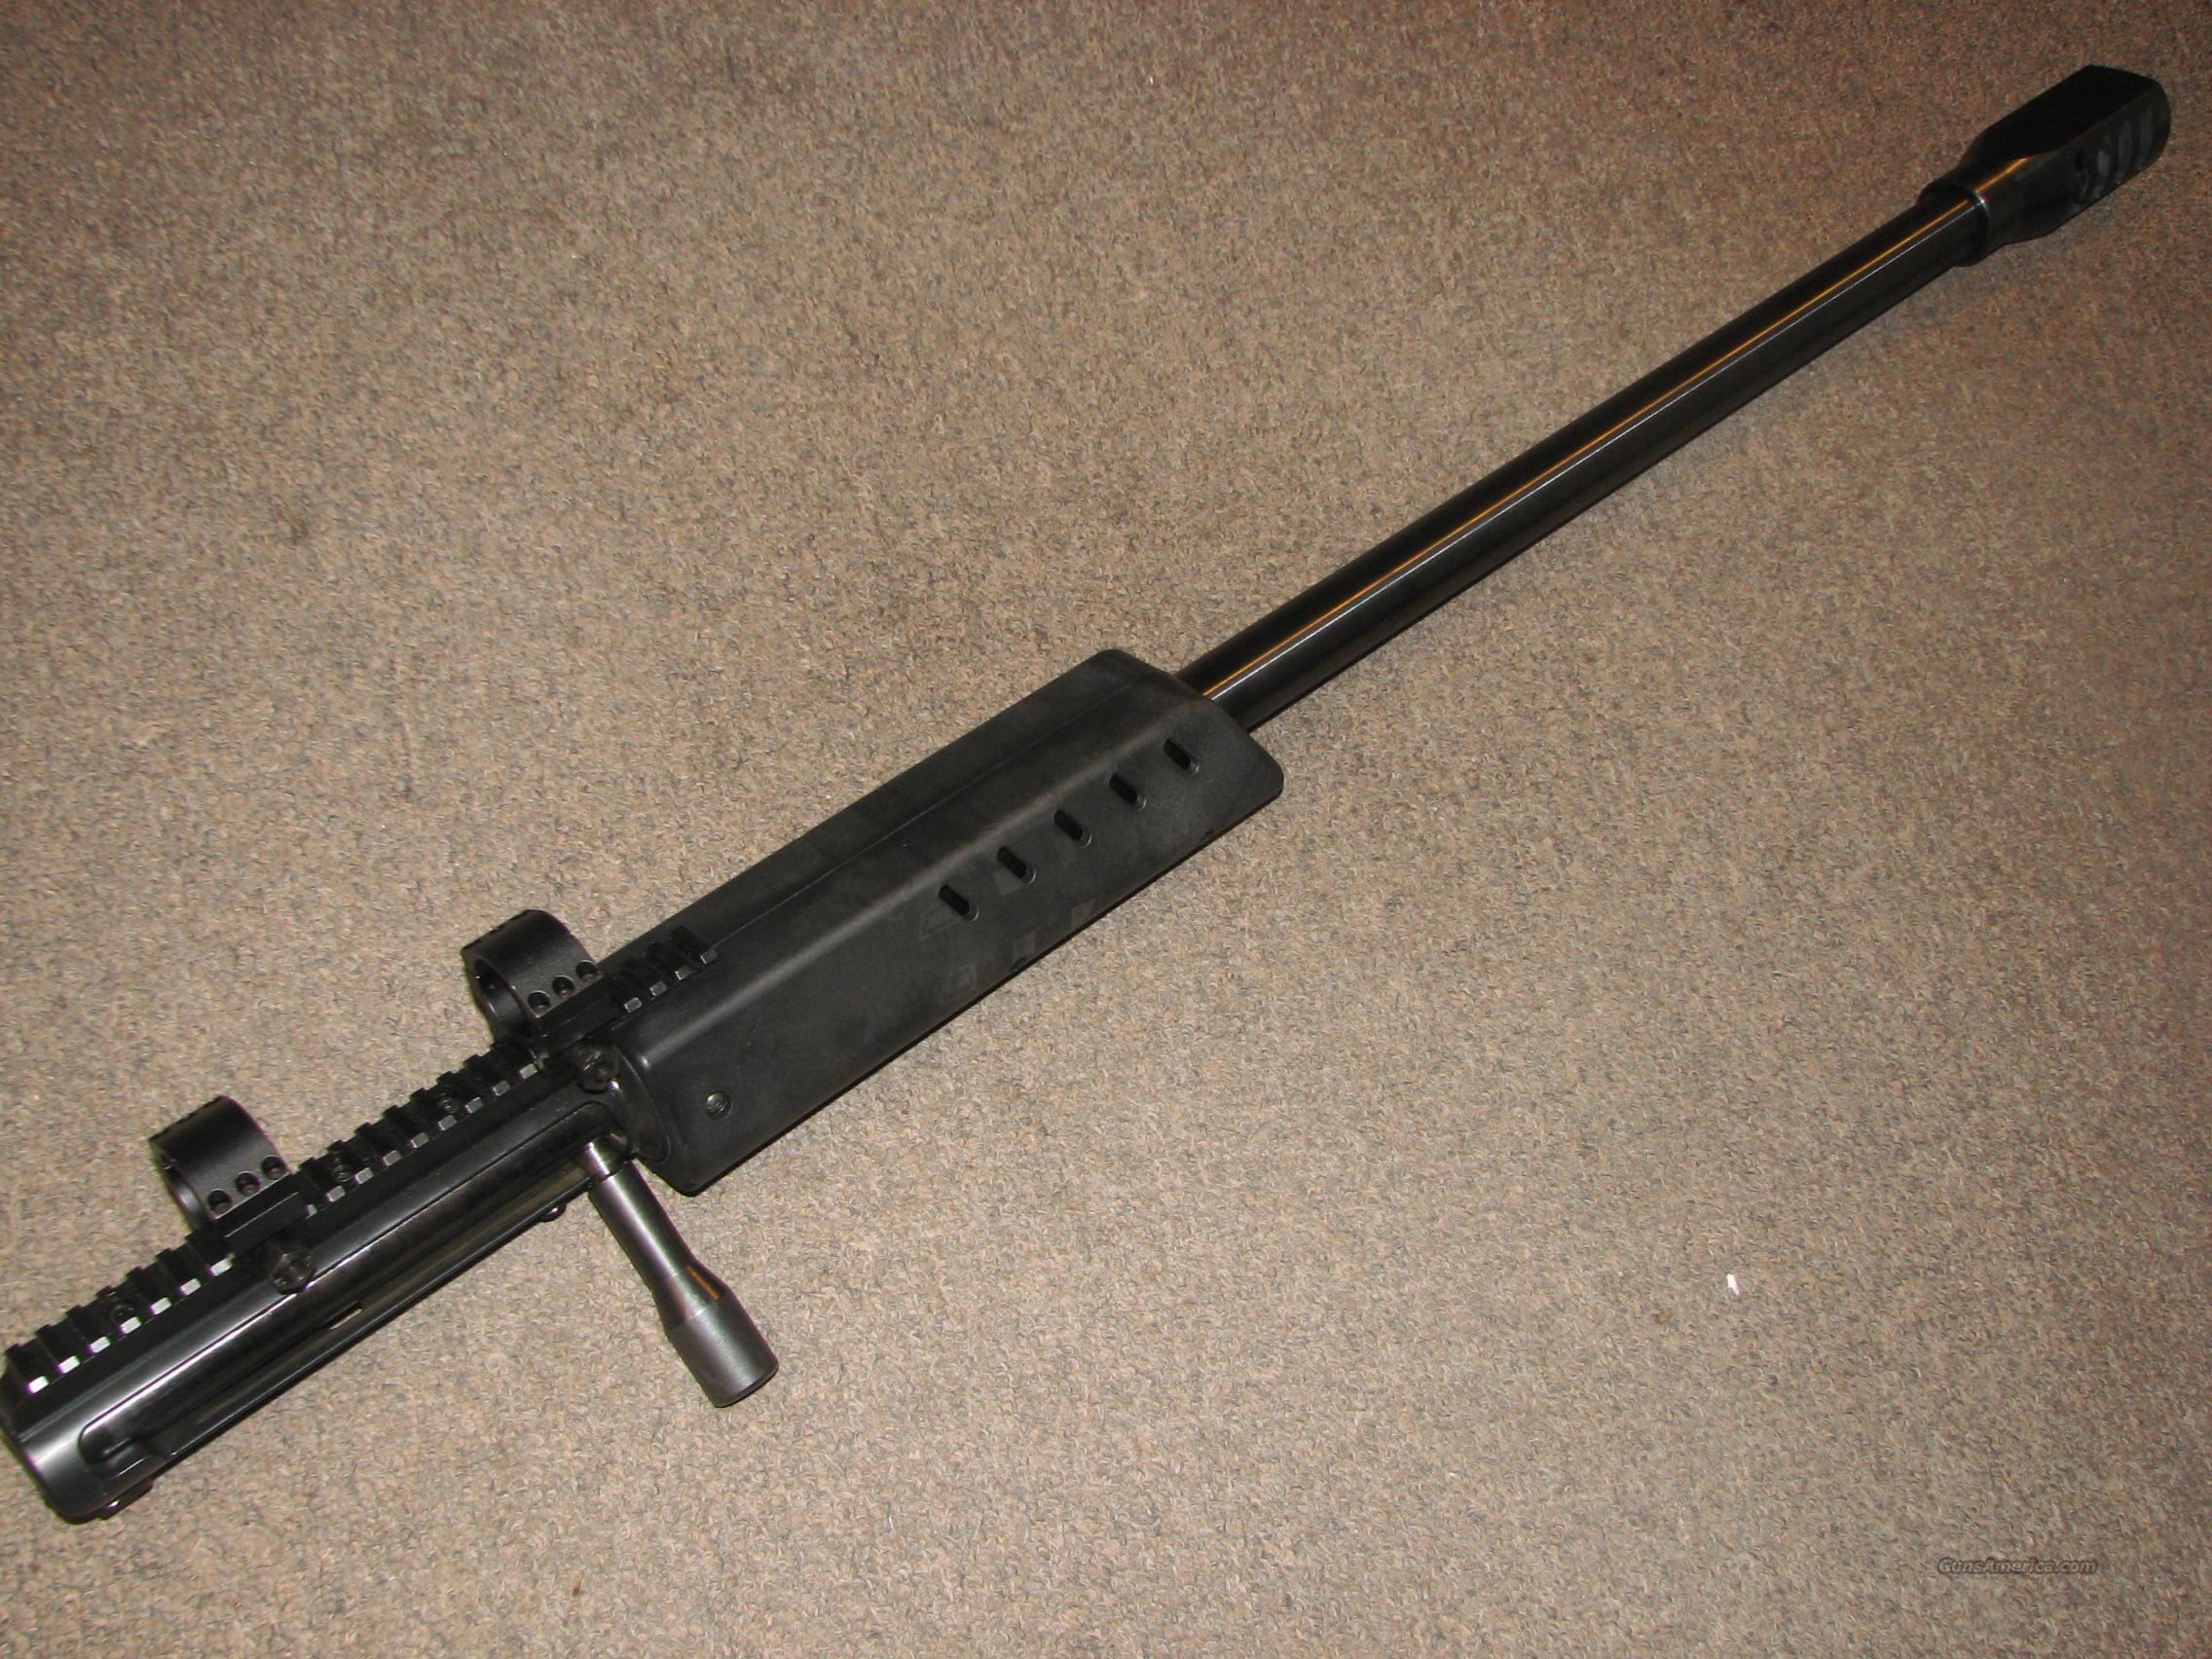 BOHICA 50-CALIBER UPPER  50 BMG